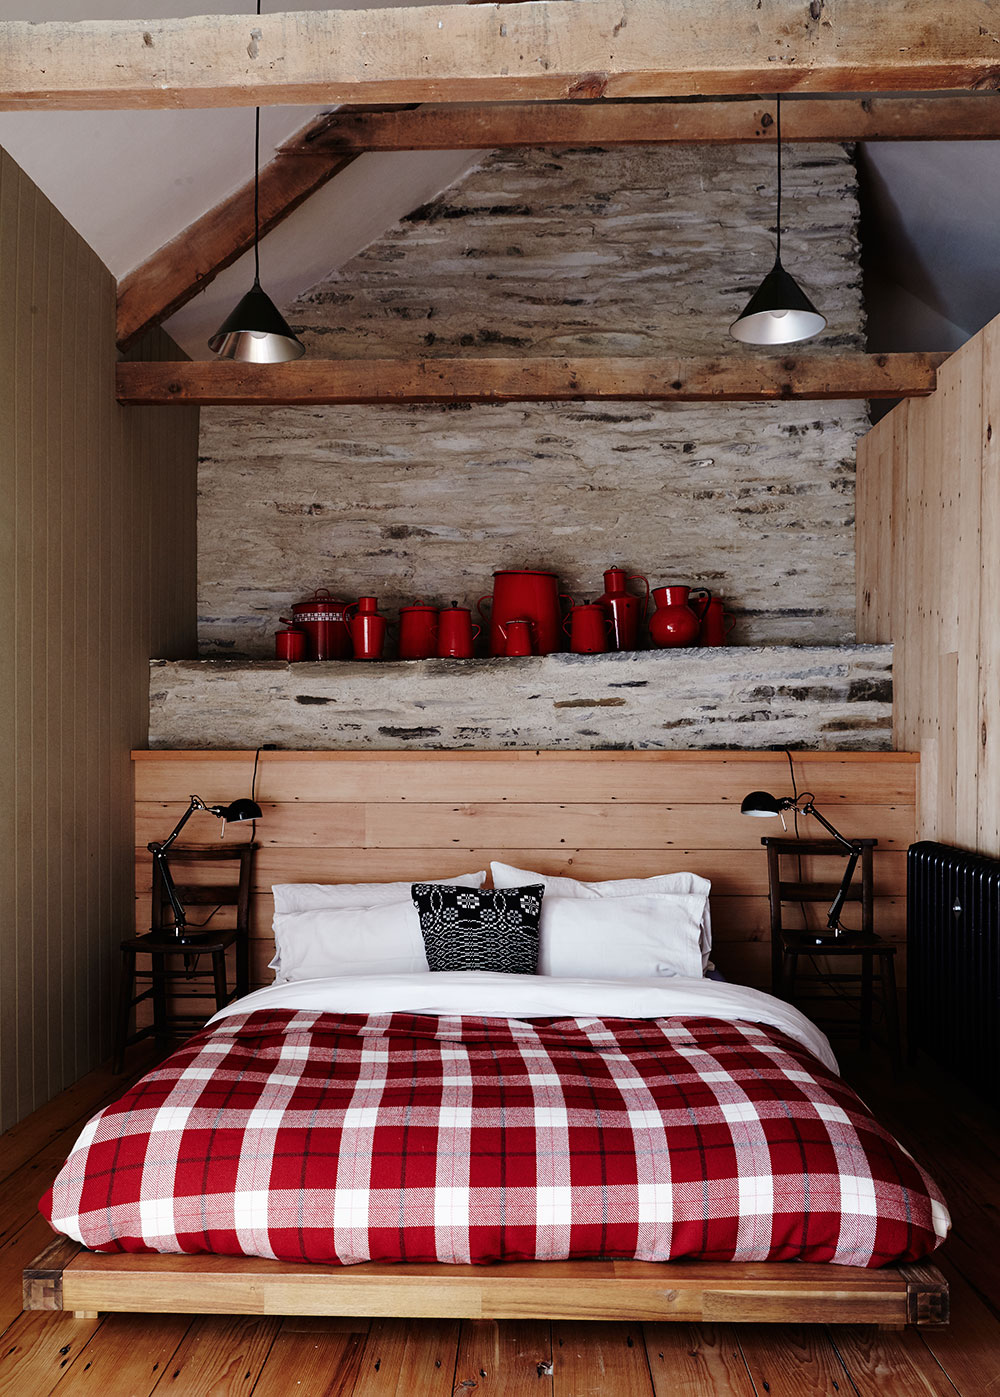 Rustic_welsh_farm_bedroom_stone.jpg